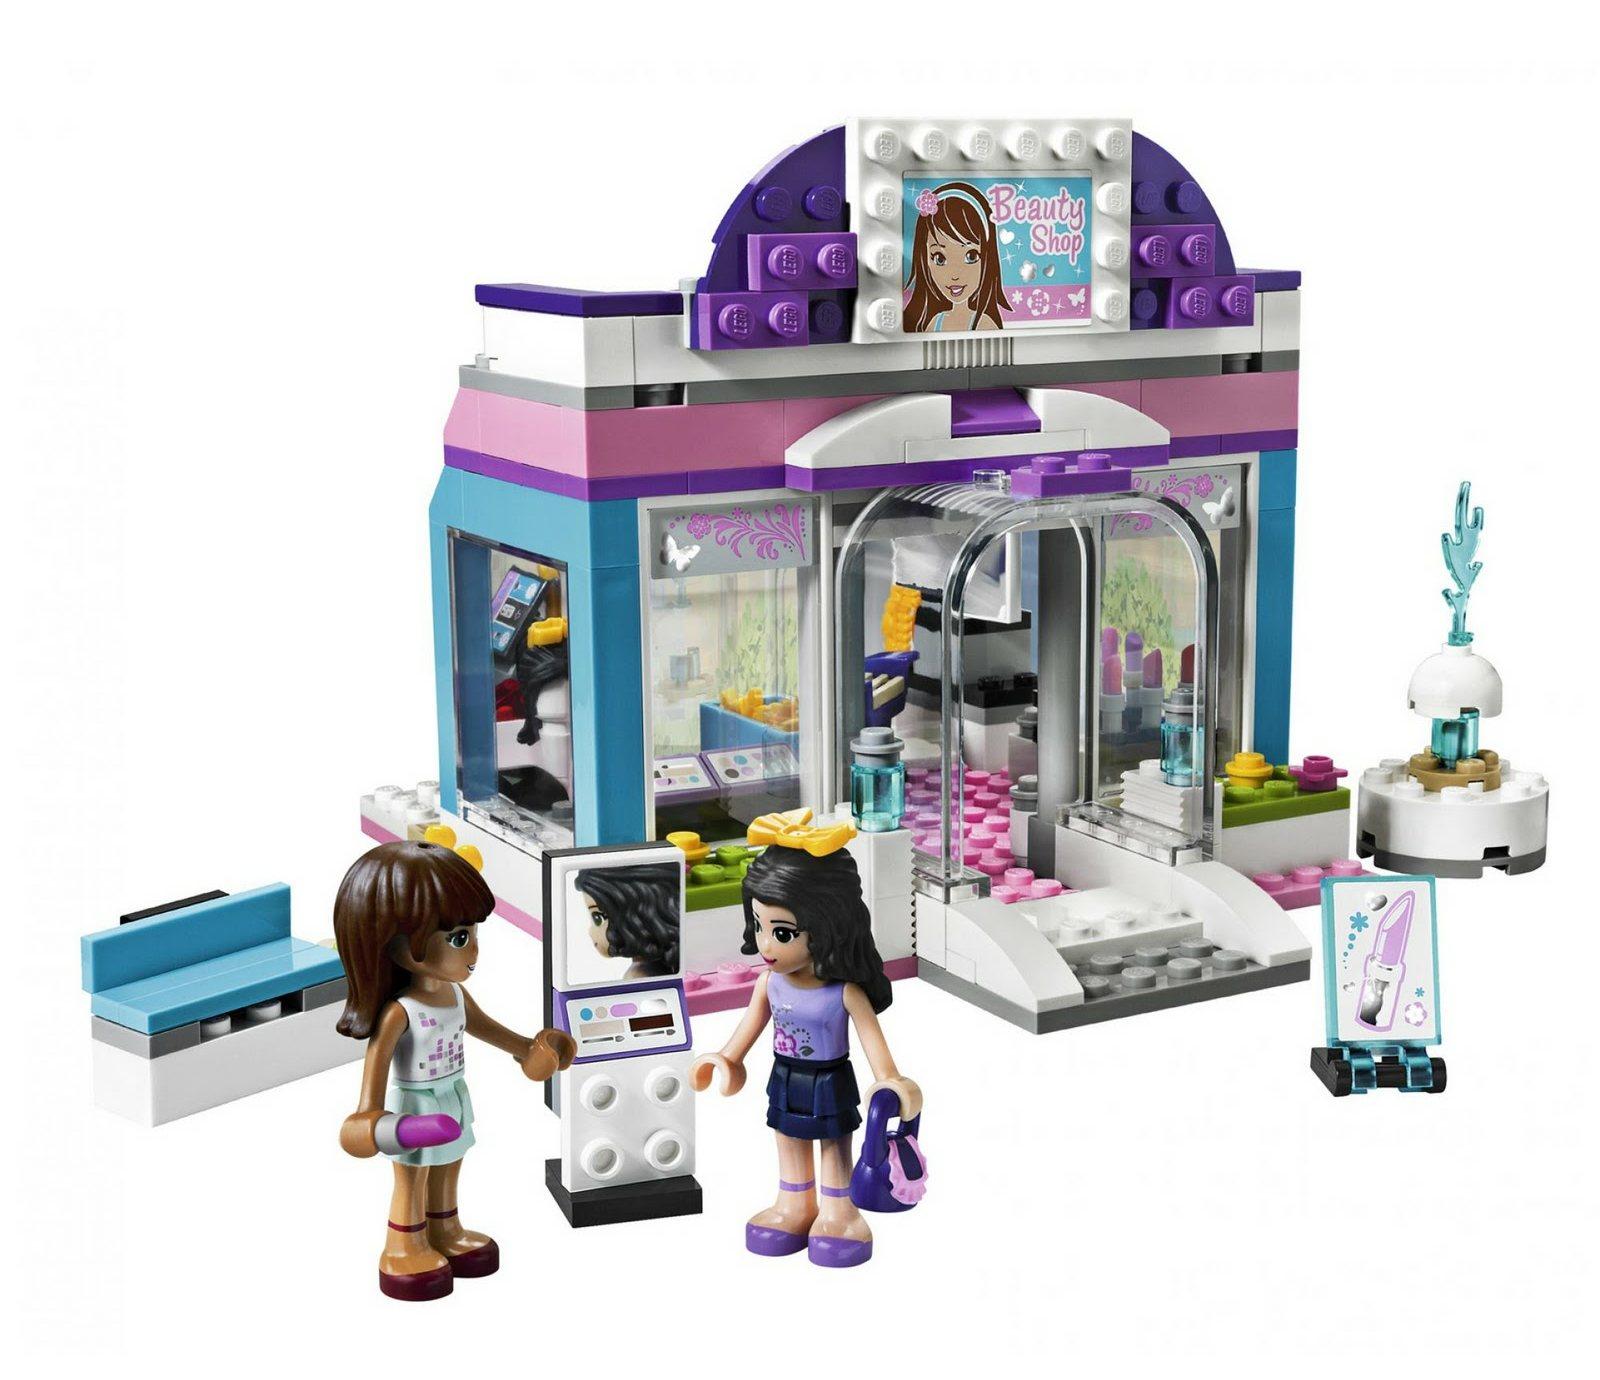 Toys For Friends : Brick friends lego butterfly beauty shop